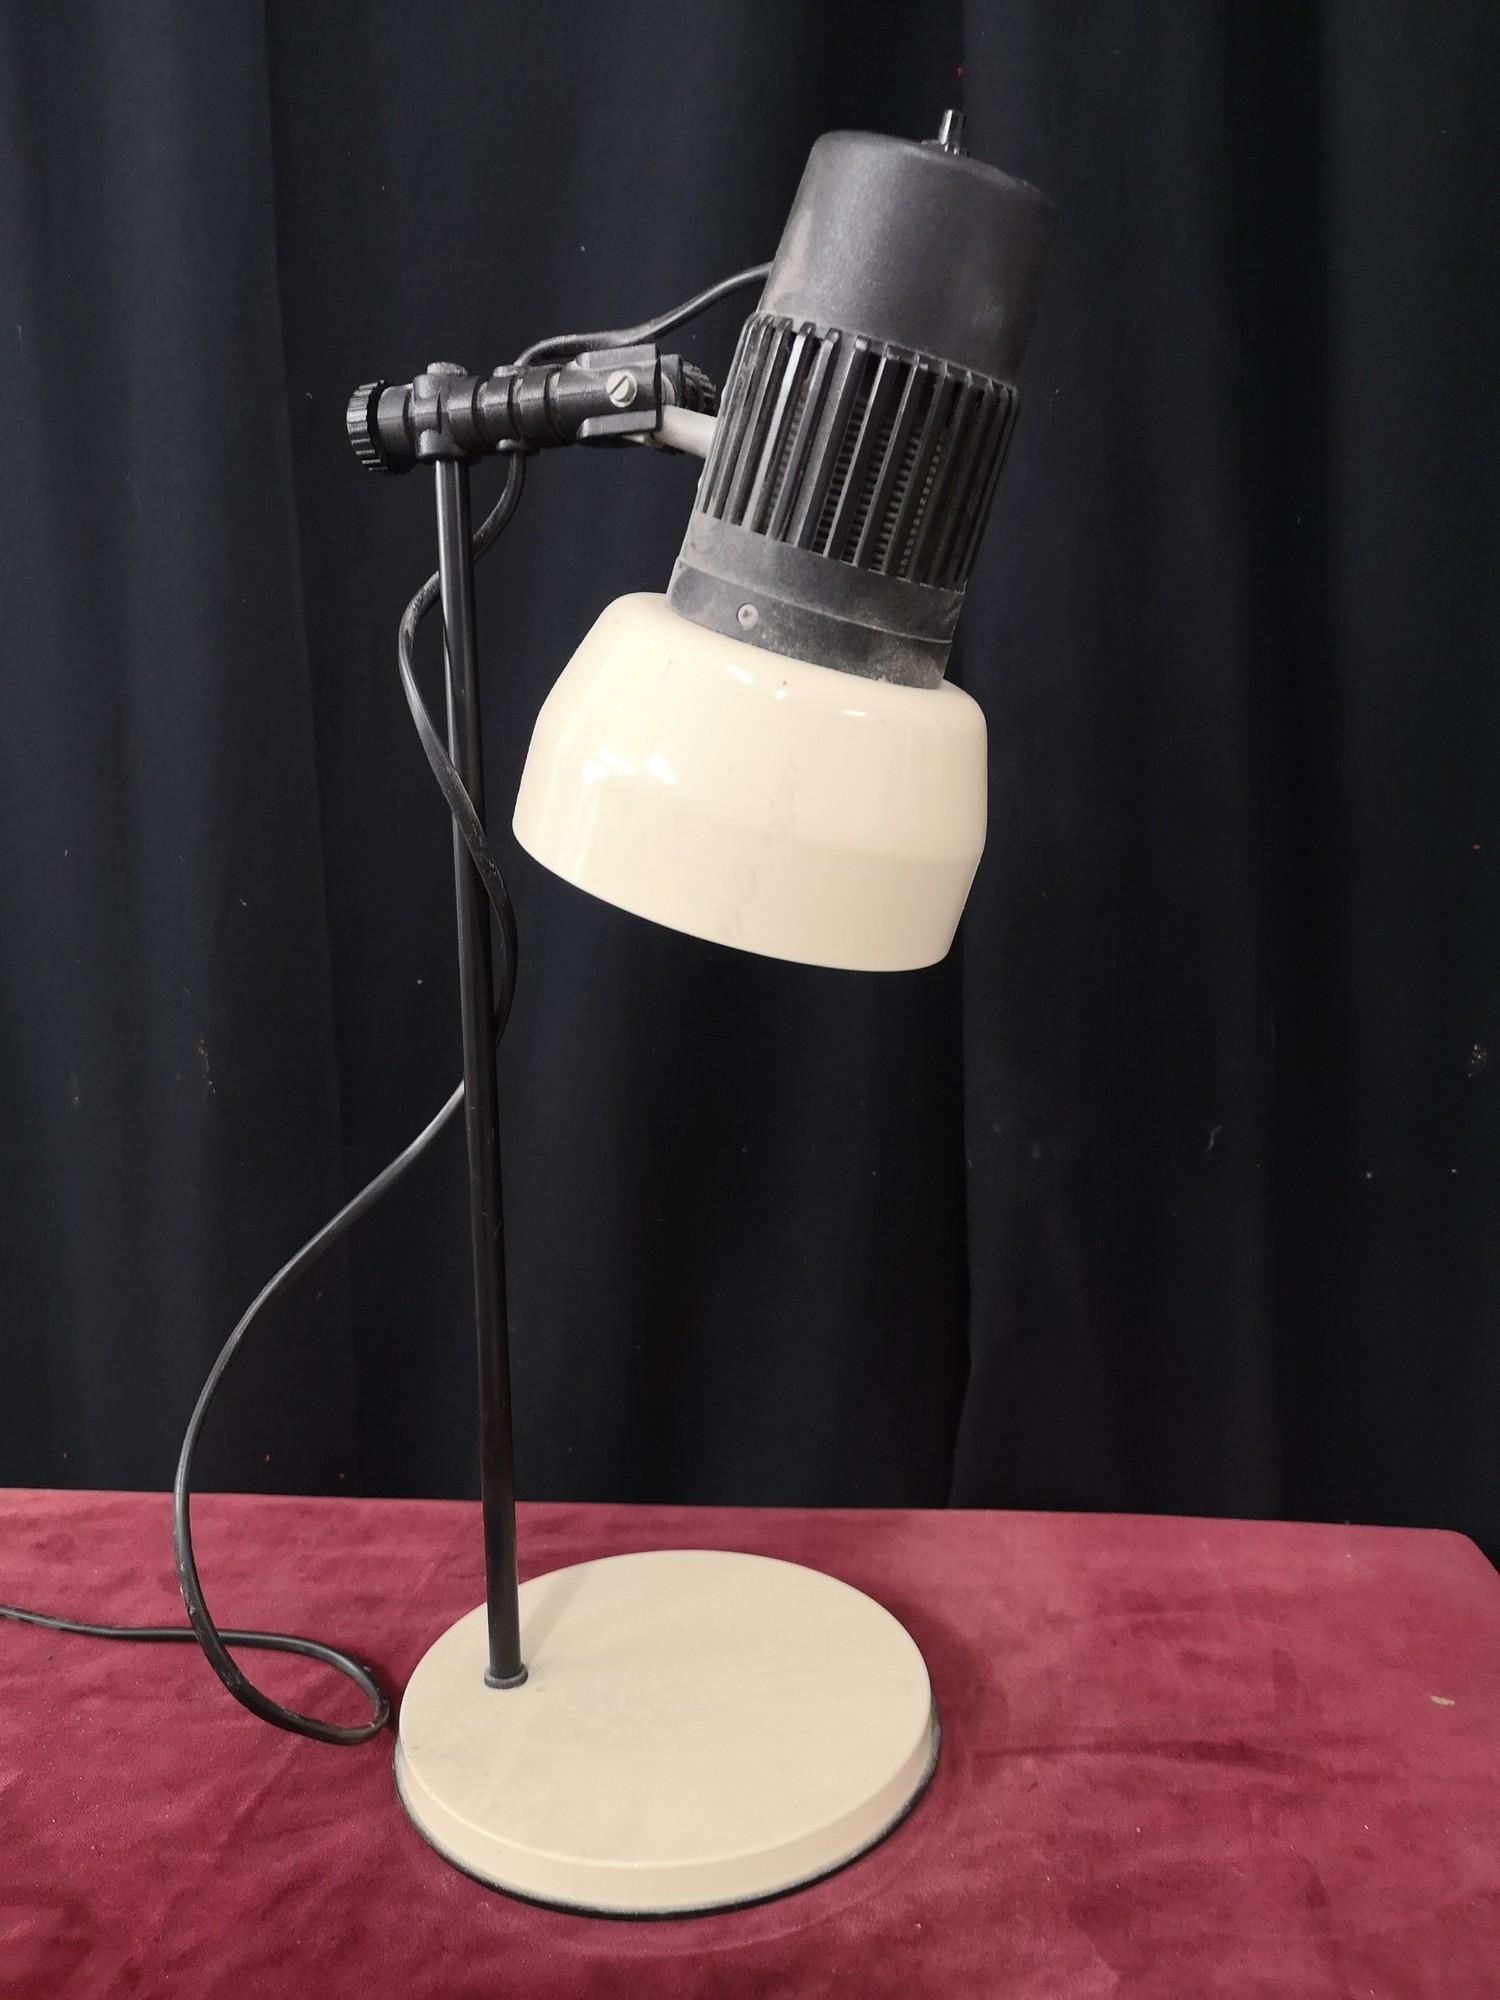 Retro 1970s angle poiste table lamp.